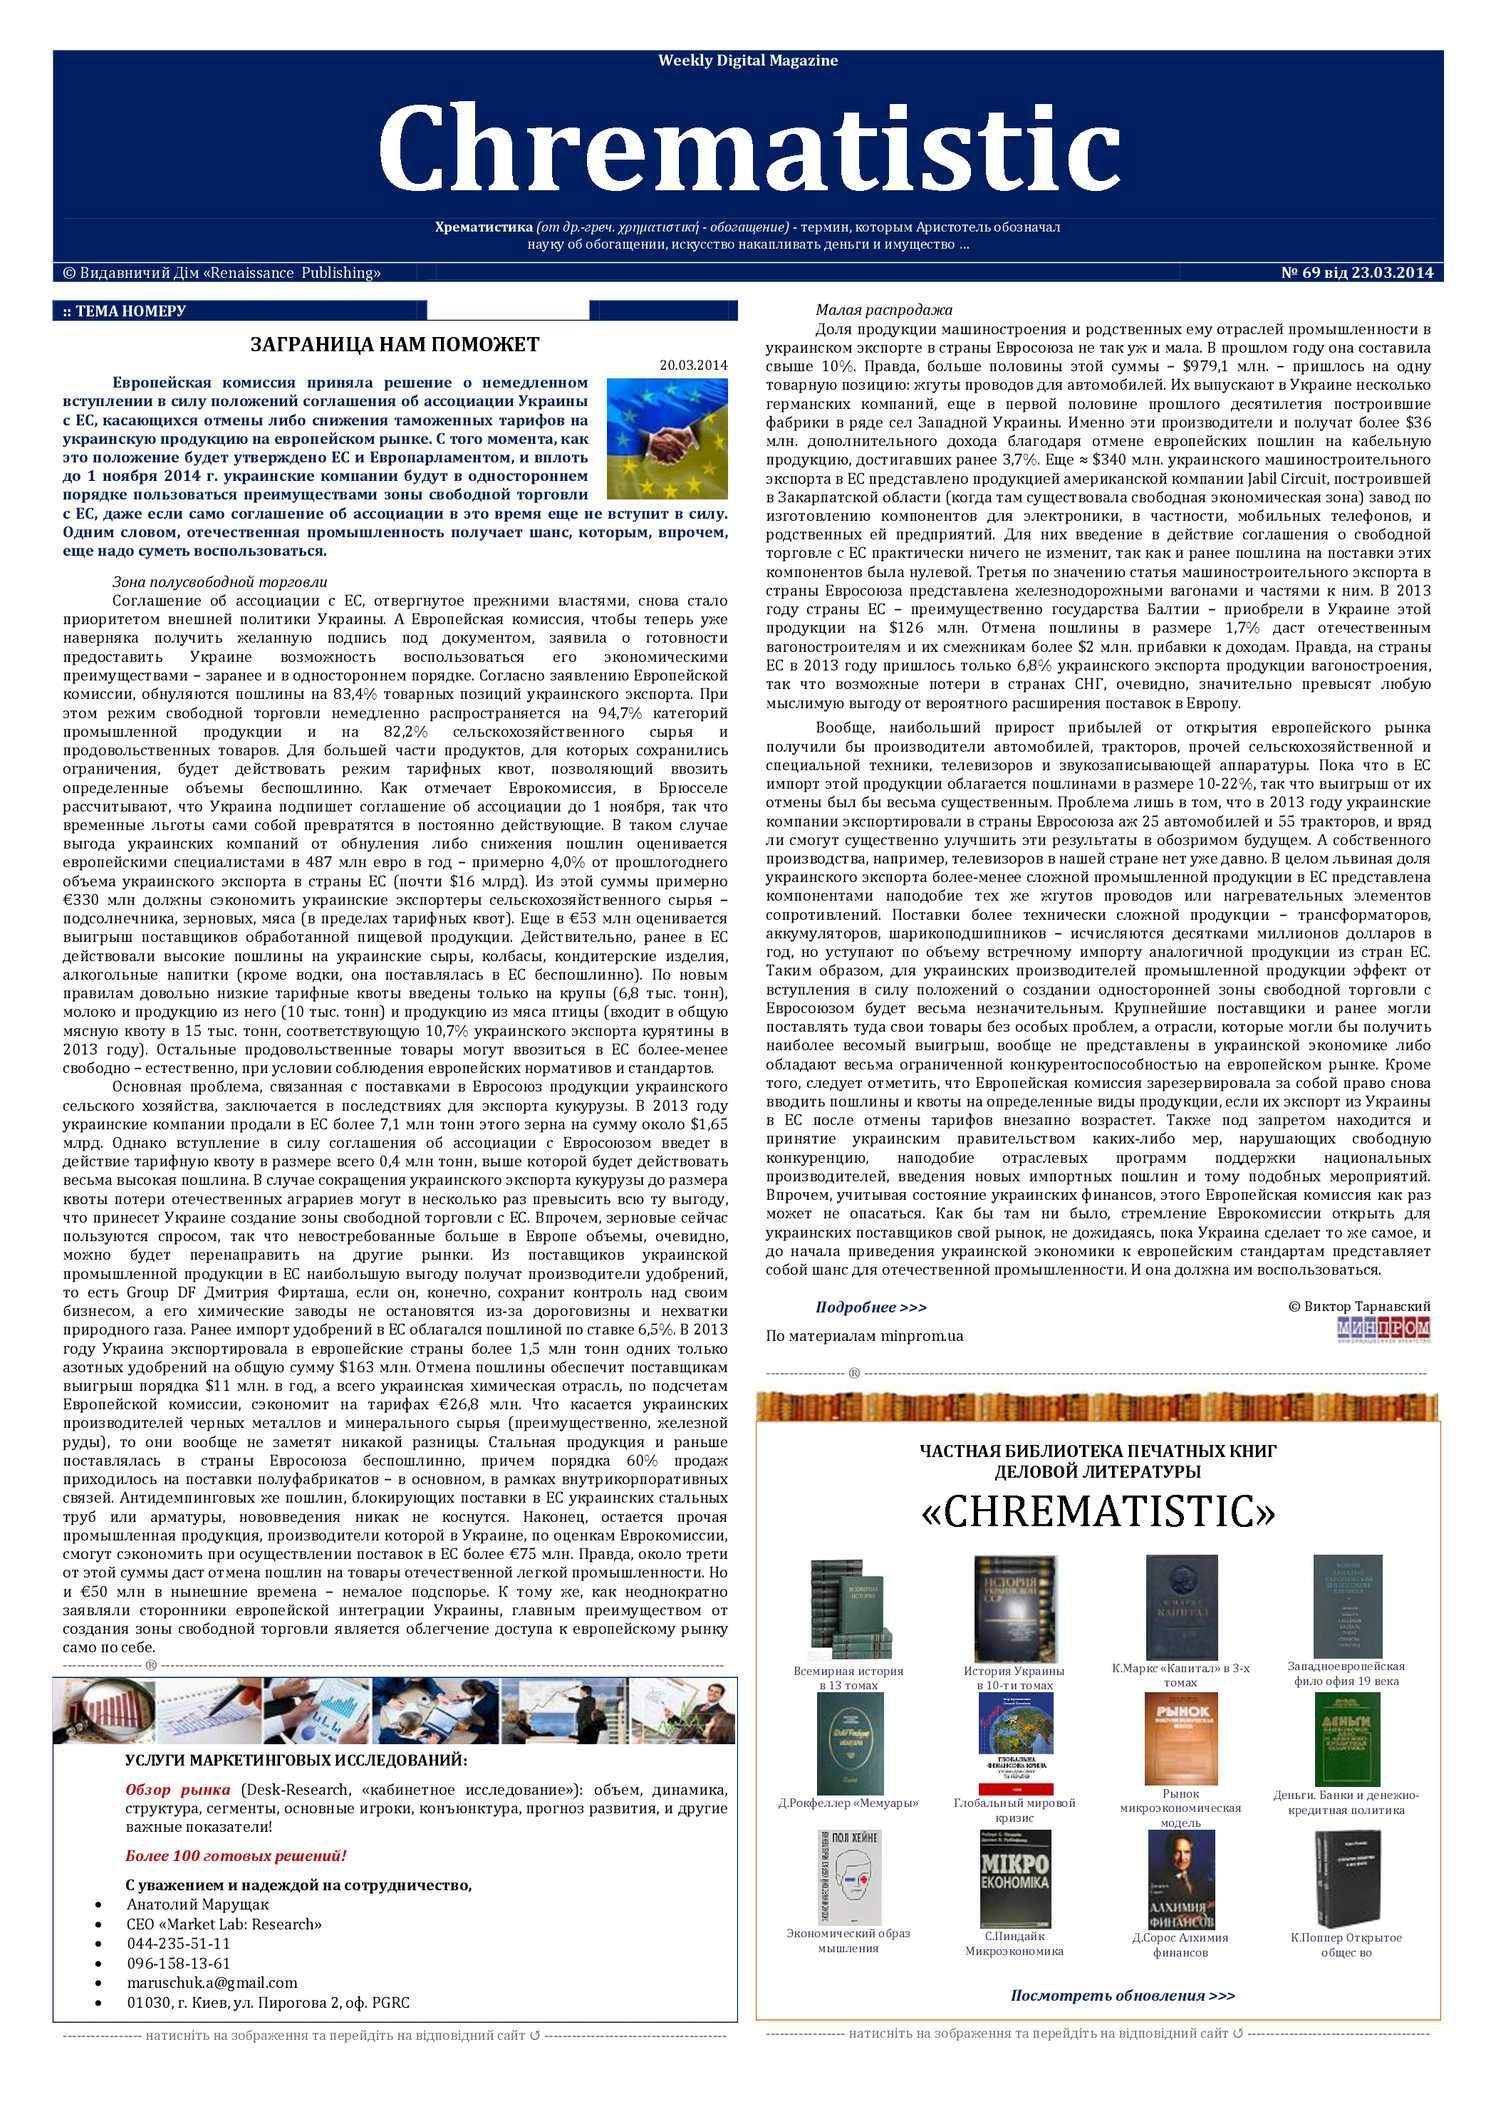 Calaméo - №69 WDM «Chrematistic» 13781c3973ee1